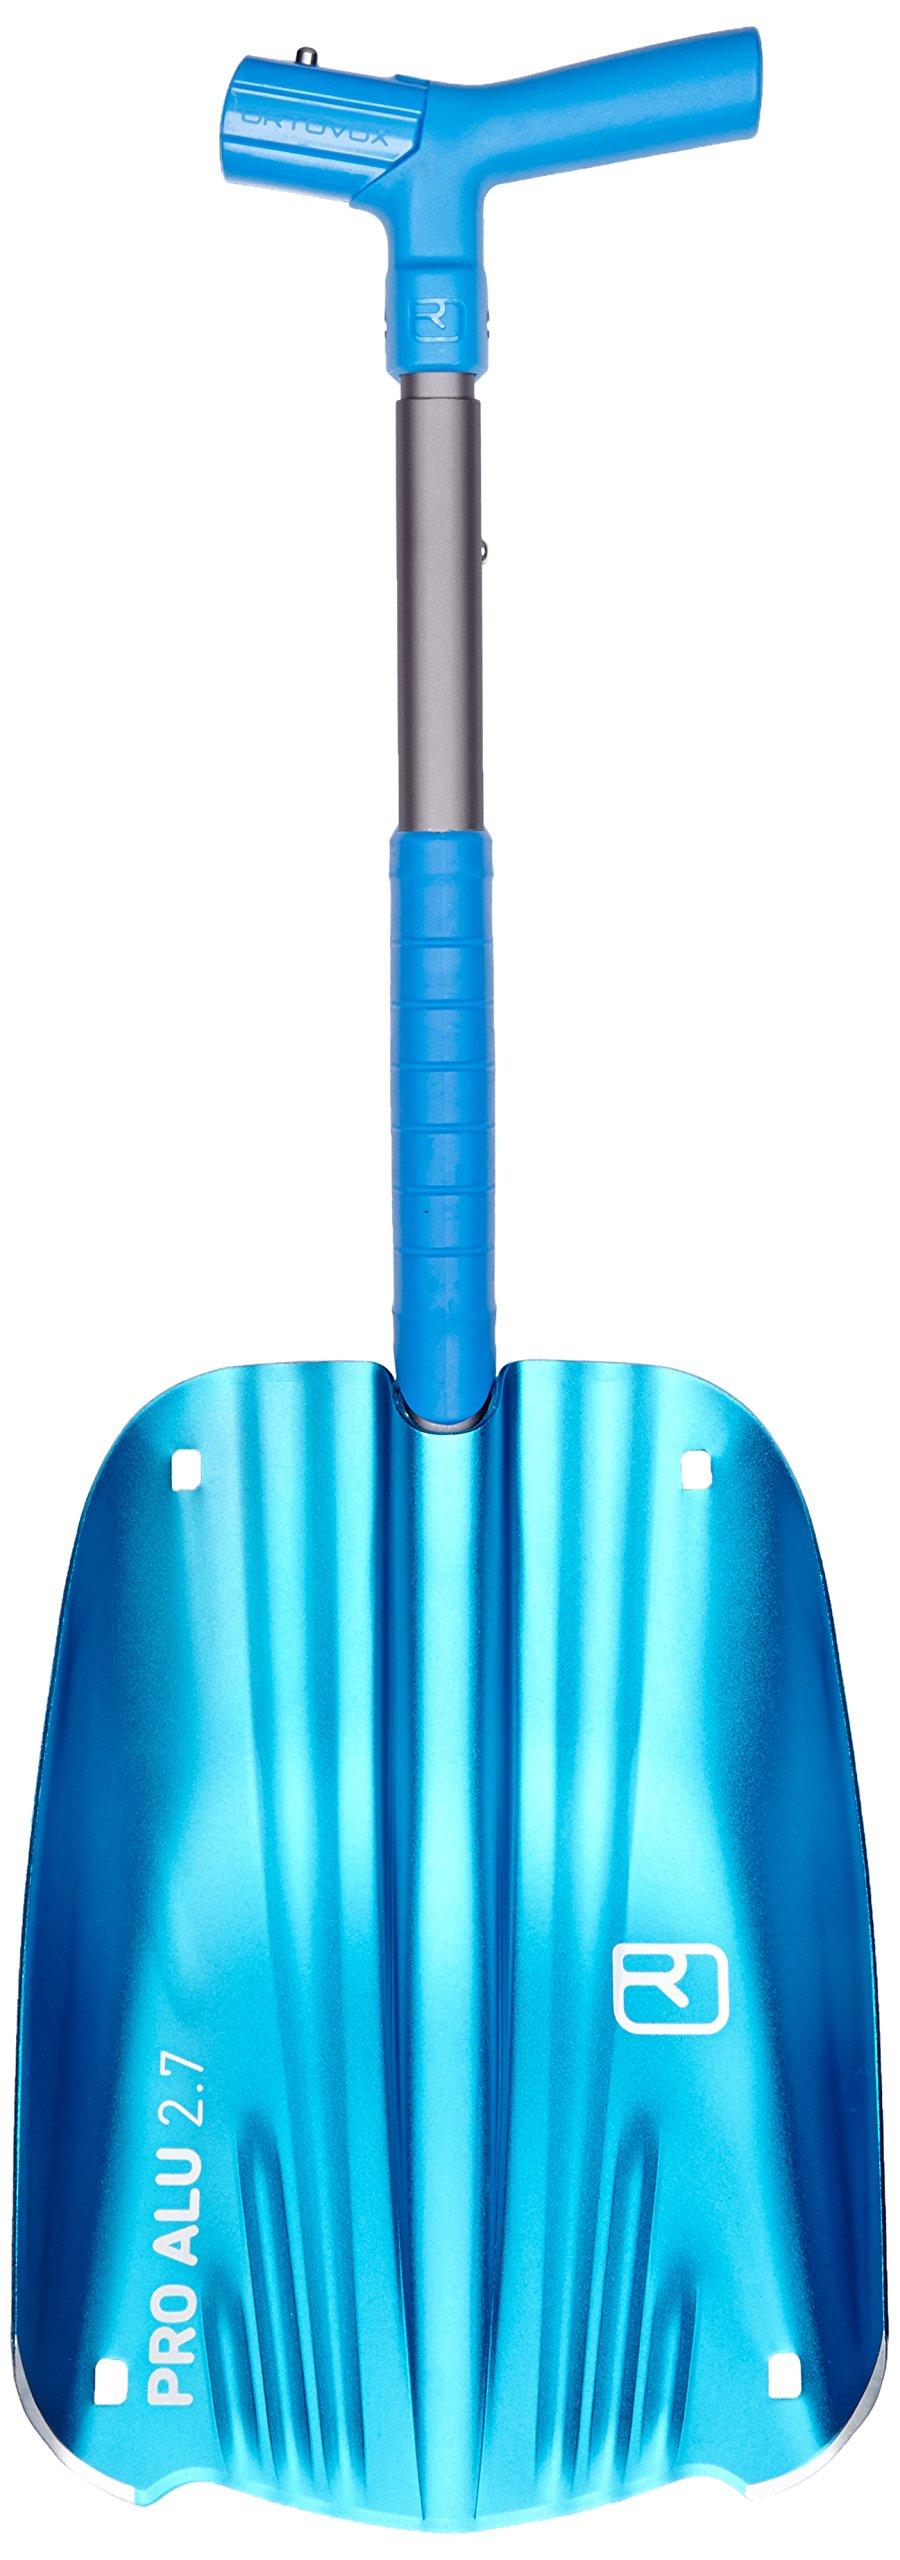 Ortovox Pro Alu III Shovel + Pocket Spike (Blue) by Ortovox